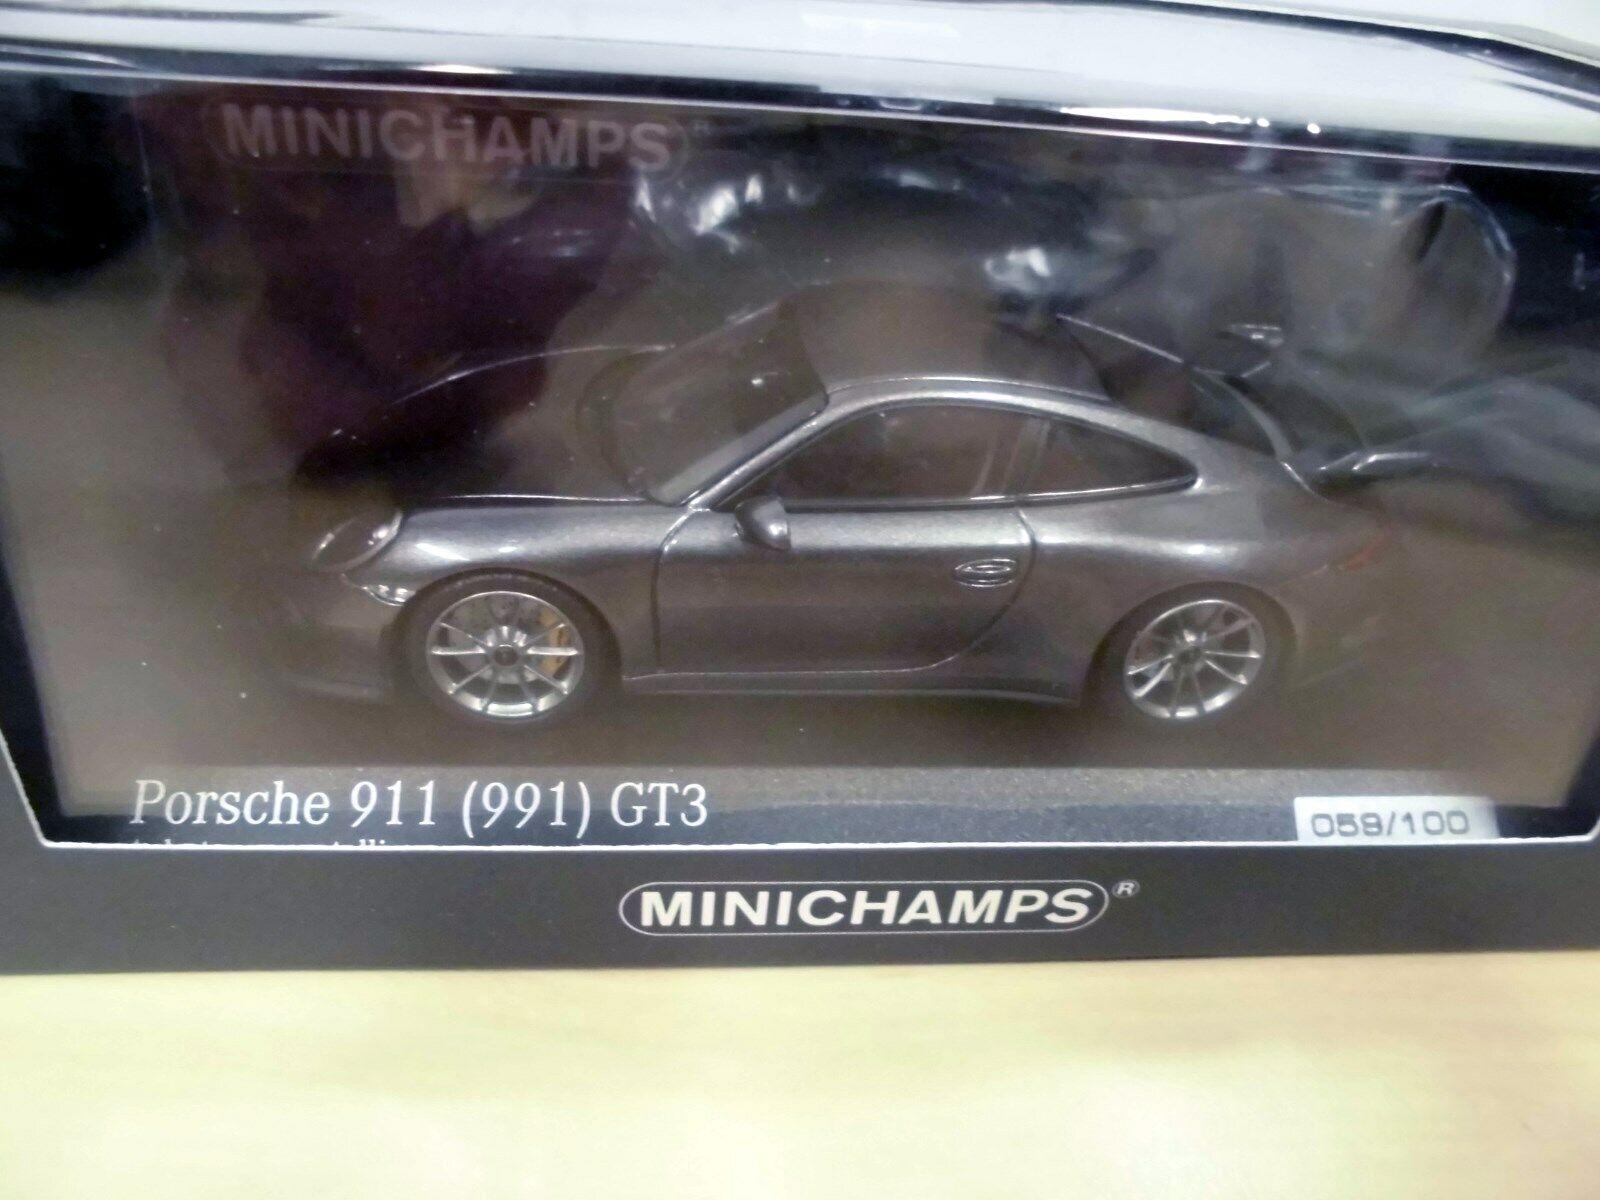 PORSCHE 911 gt3 (991) 2013-Agata Grigio Metallico-Minichamps ca 043 16 022 -1 43